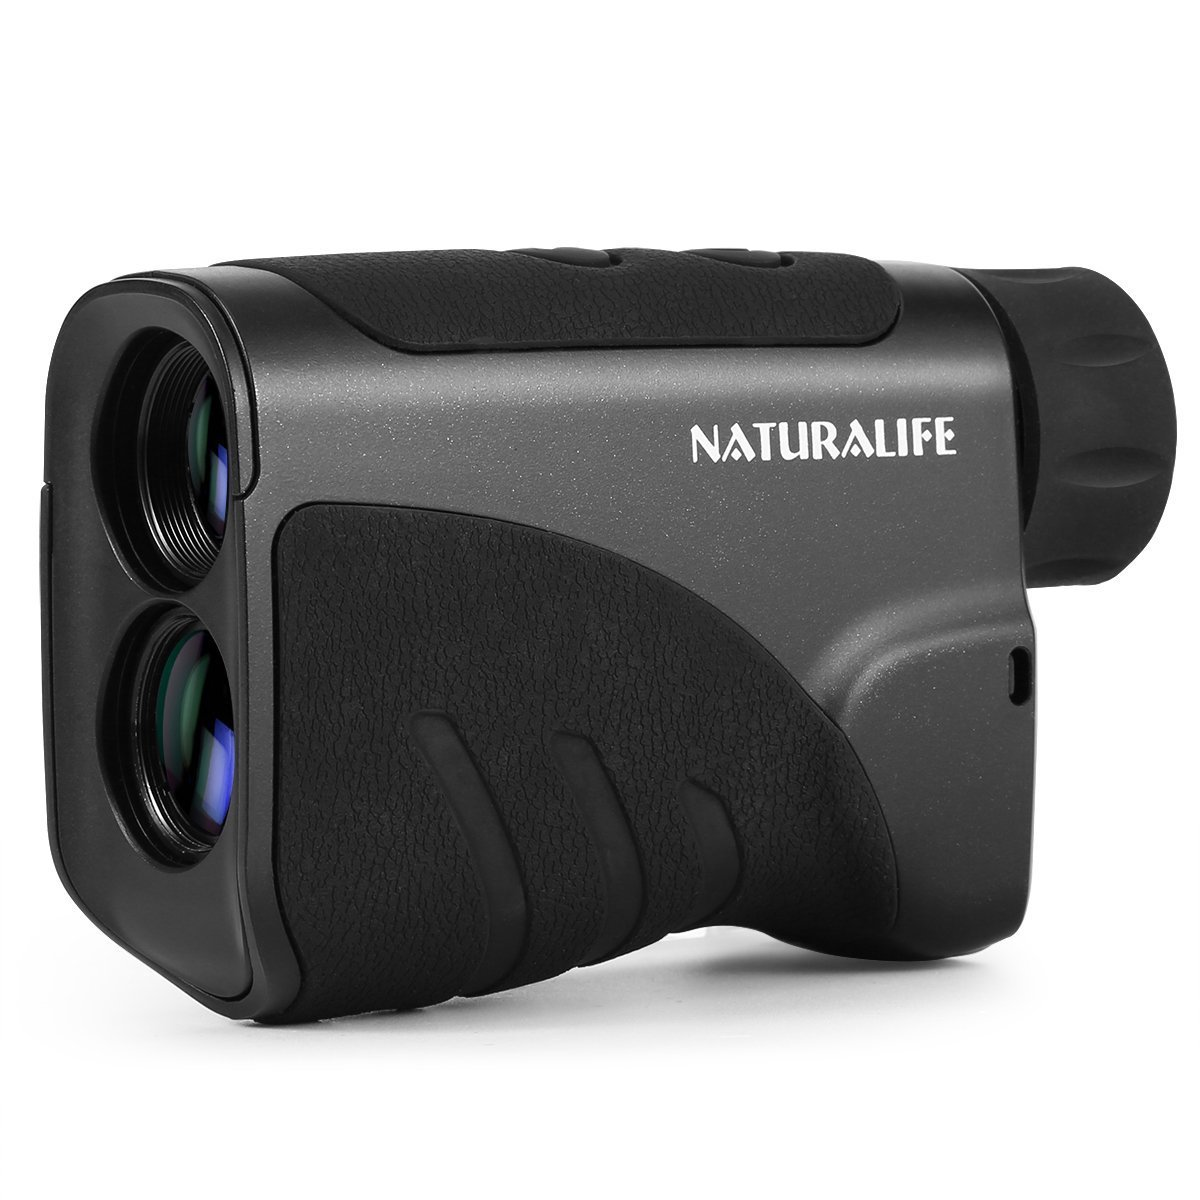 Naturalife Golf Laser Rangefinder, Hunting Laser rangefinder, Multifunctional Vertical Range Finder for Outdoor Activities, 656 Yard Range